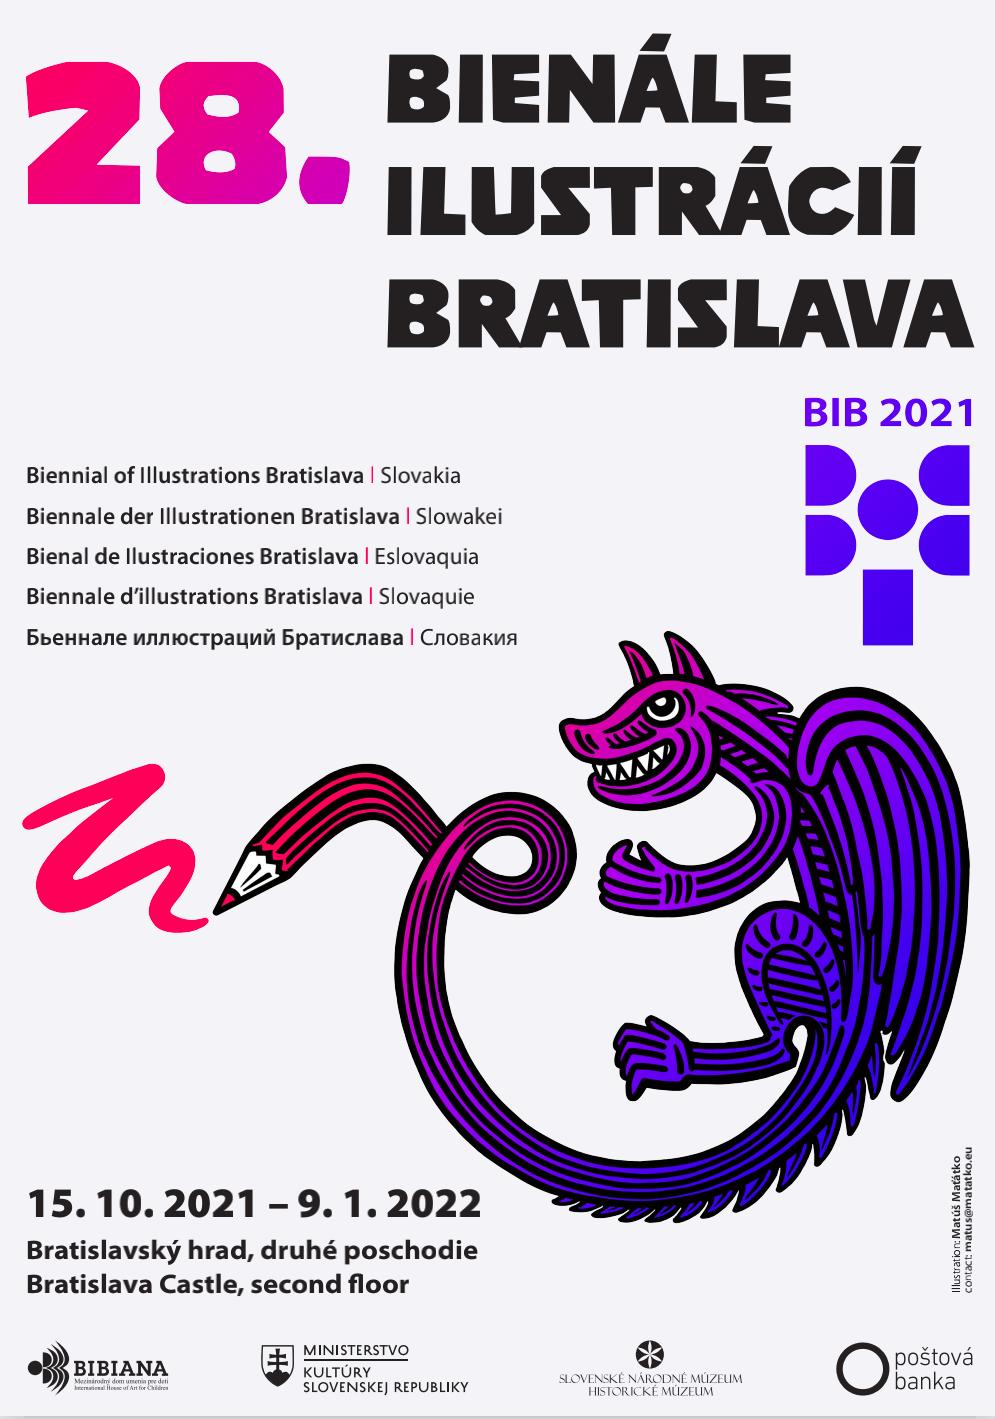 2021BIB国际插画奖评选启动,中国区唯一报名通道明日开通!-出版人杂志官网